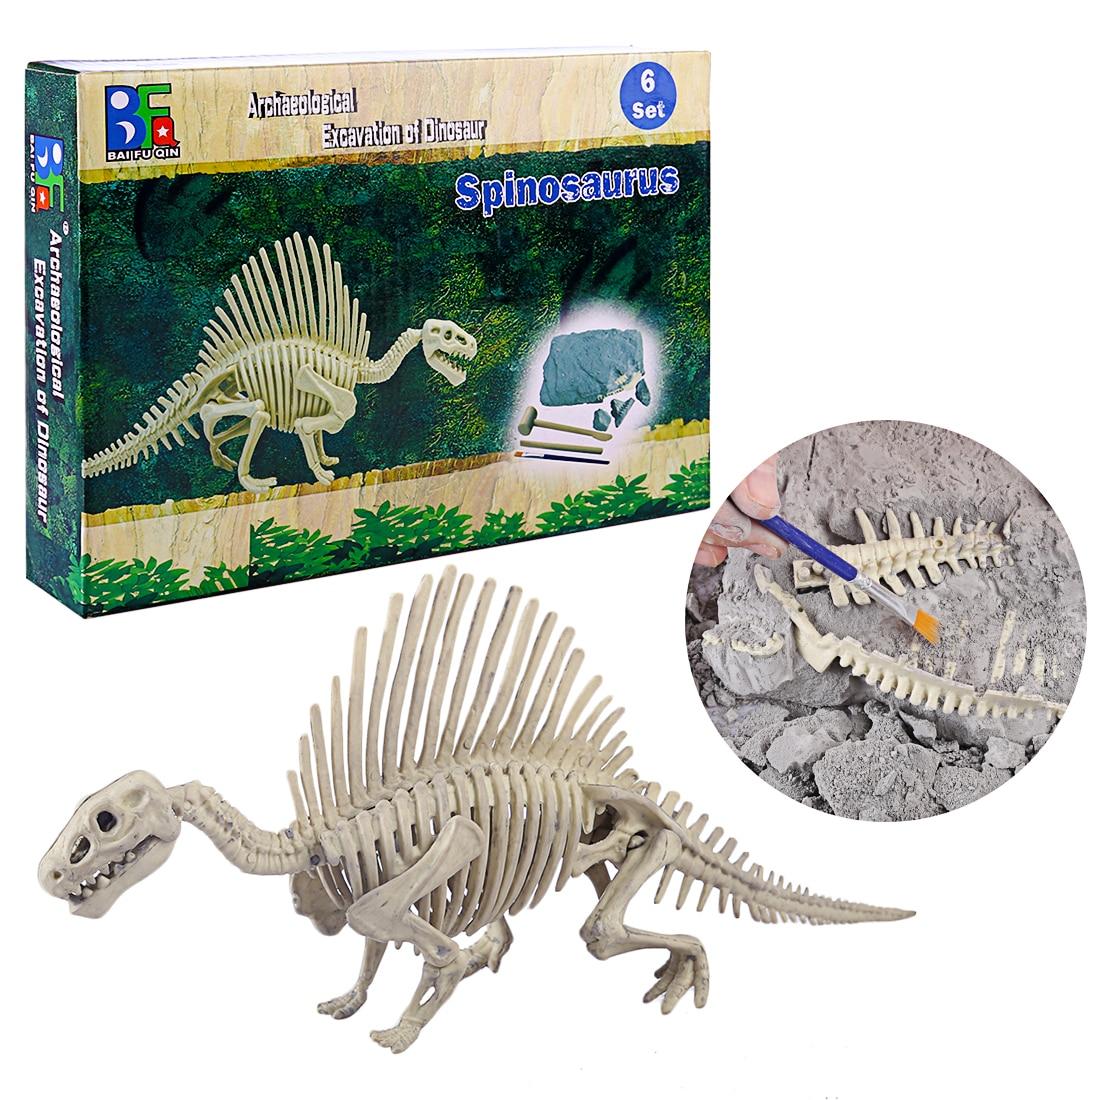 Children Creative Educational Dinosaur Archaeology Excavation Toys - Spinosaurus  Ceratosaurus